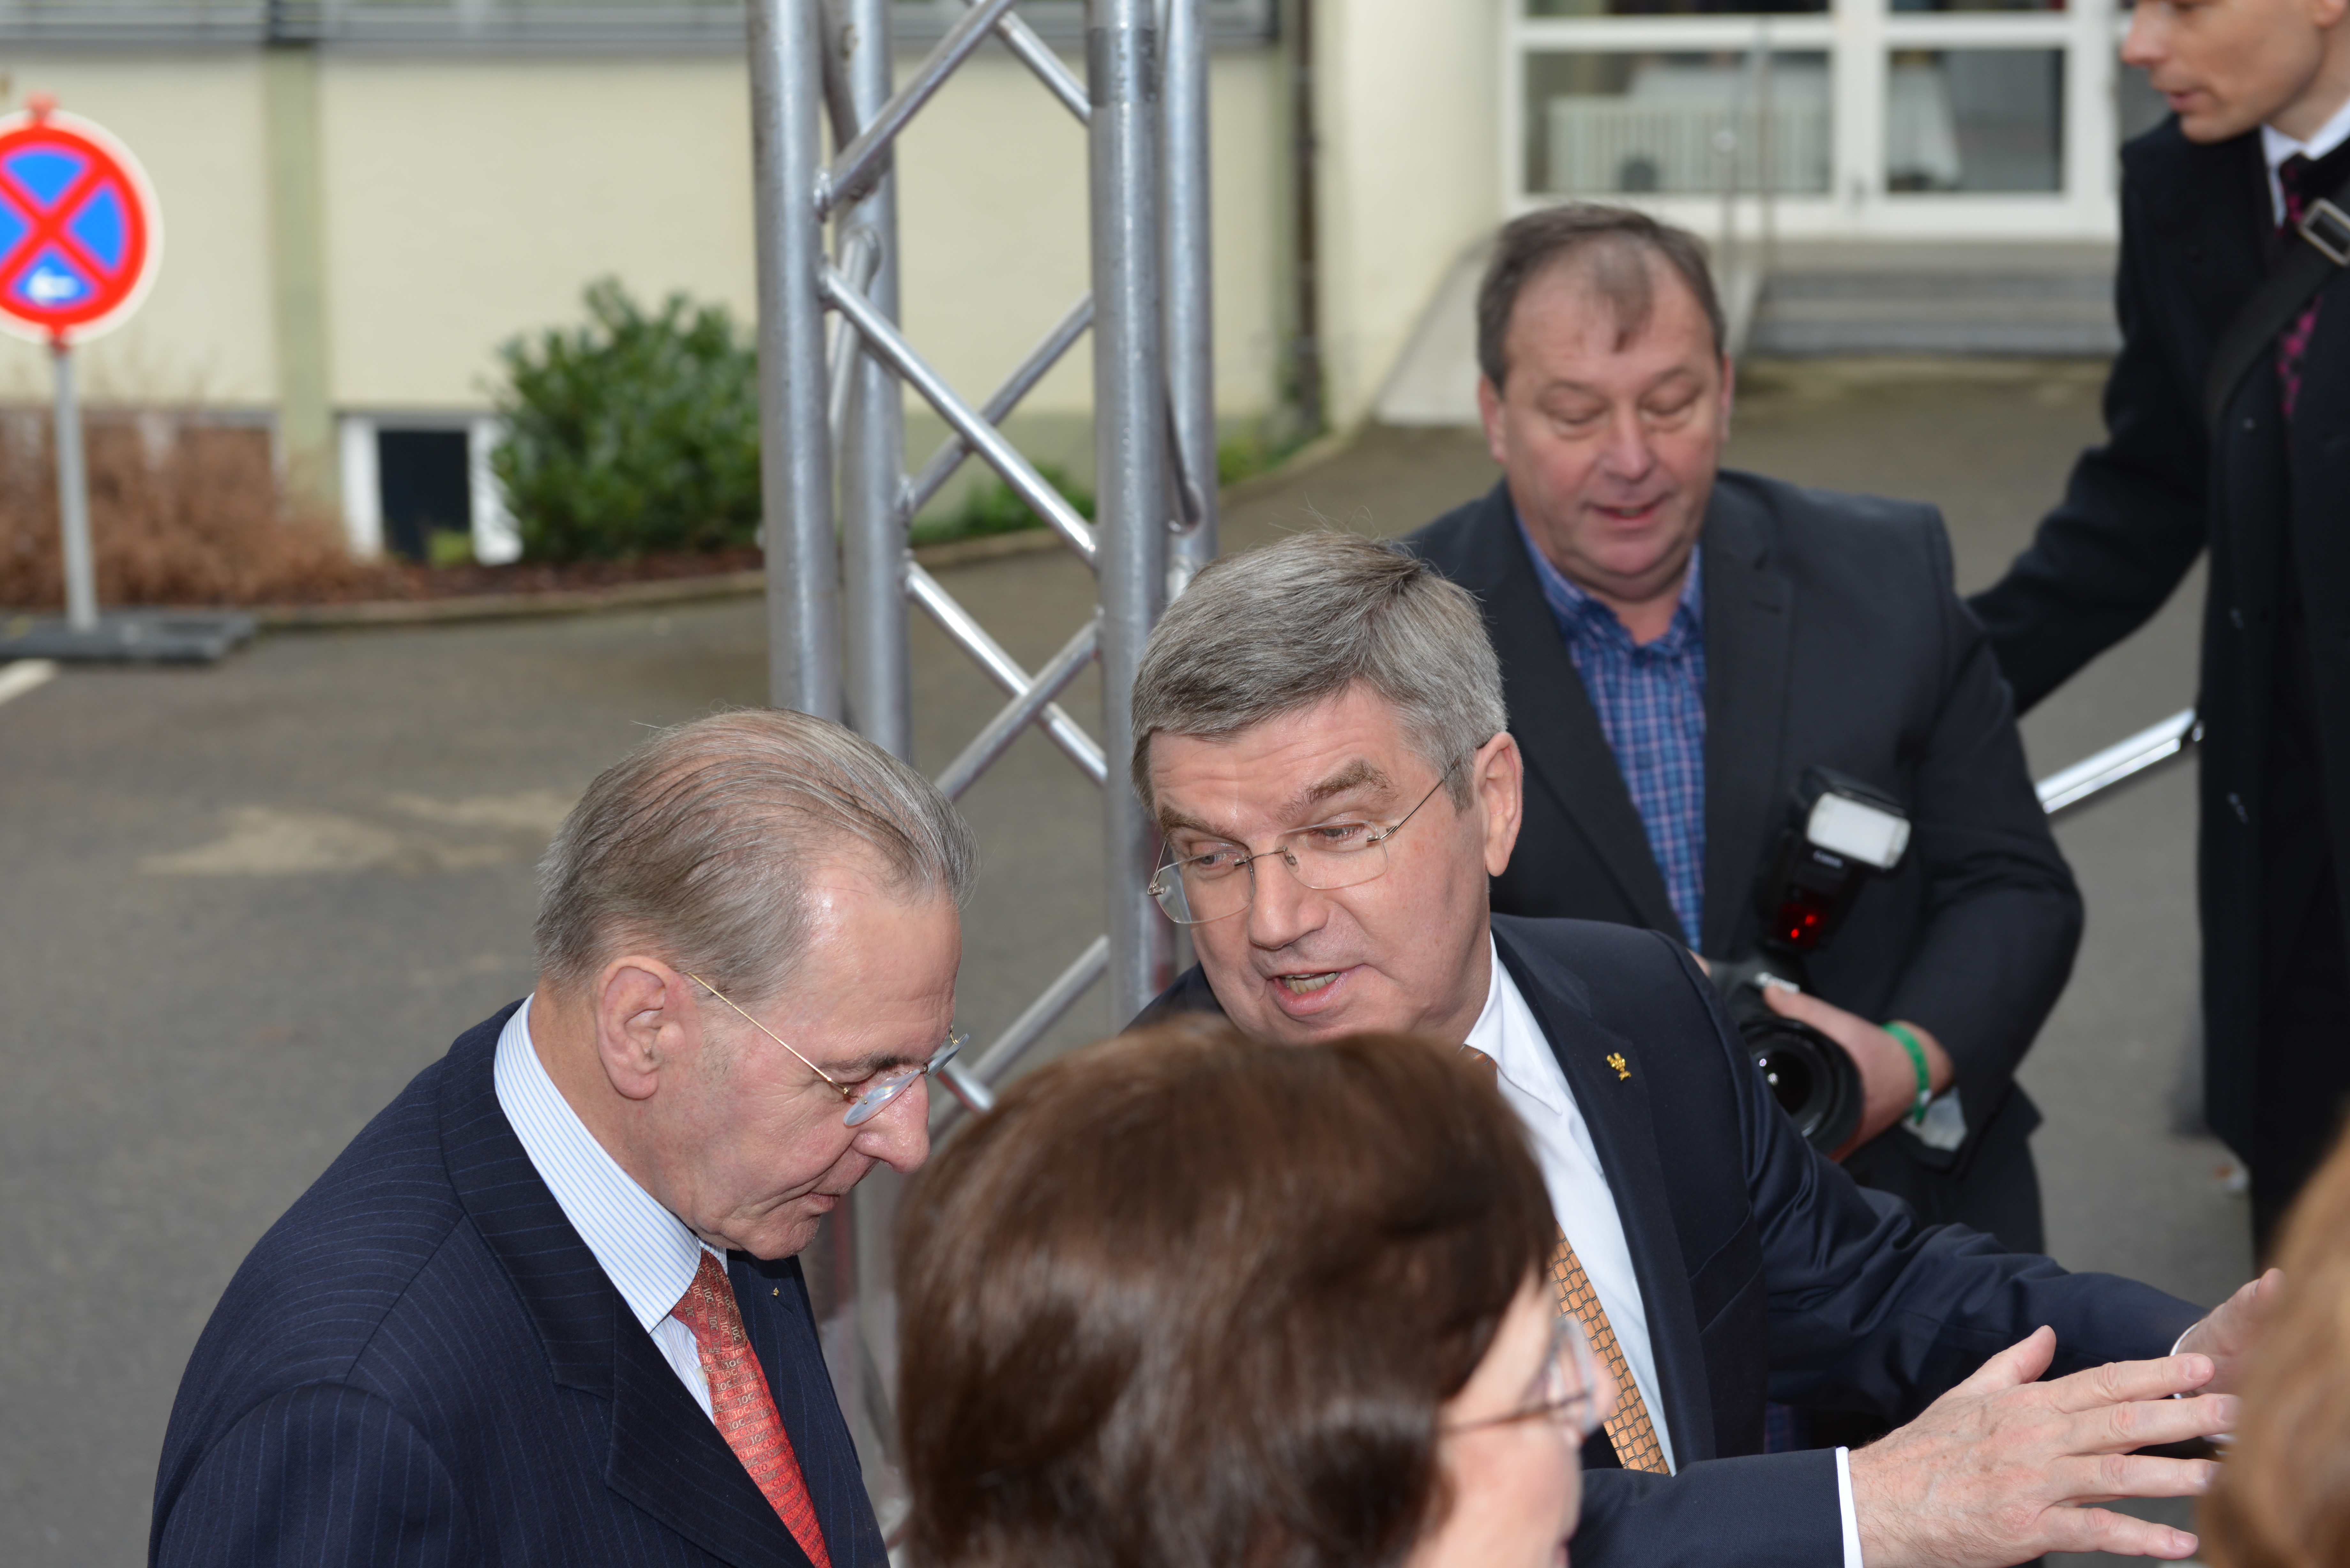 File:Empfang IOC Präsident Thomas Bach mit Jacques Rogge (8 von 9 ...